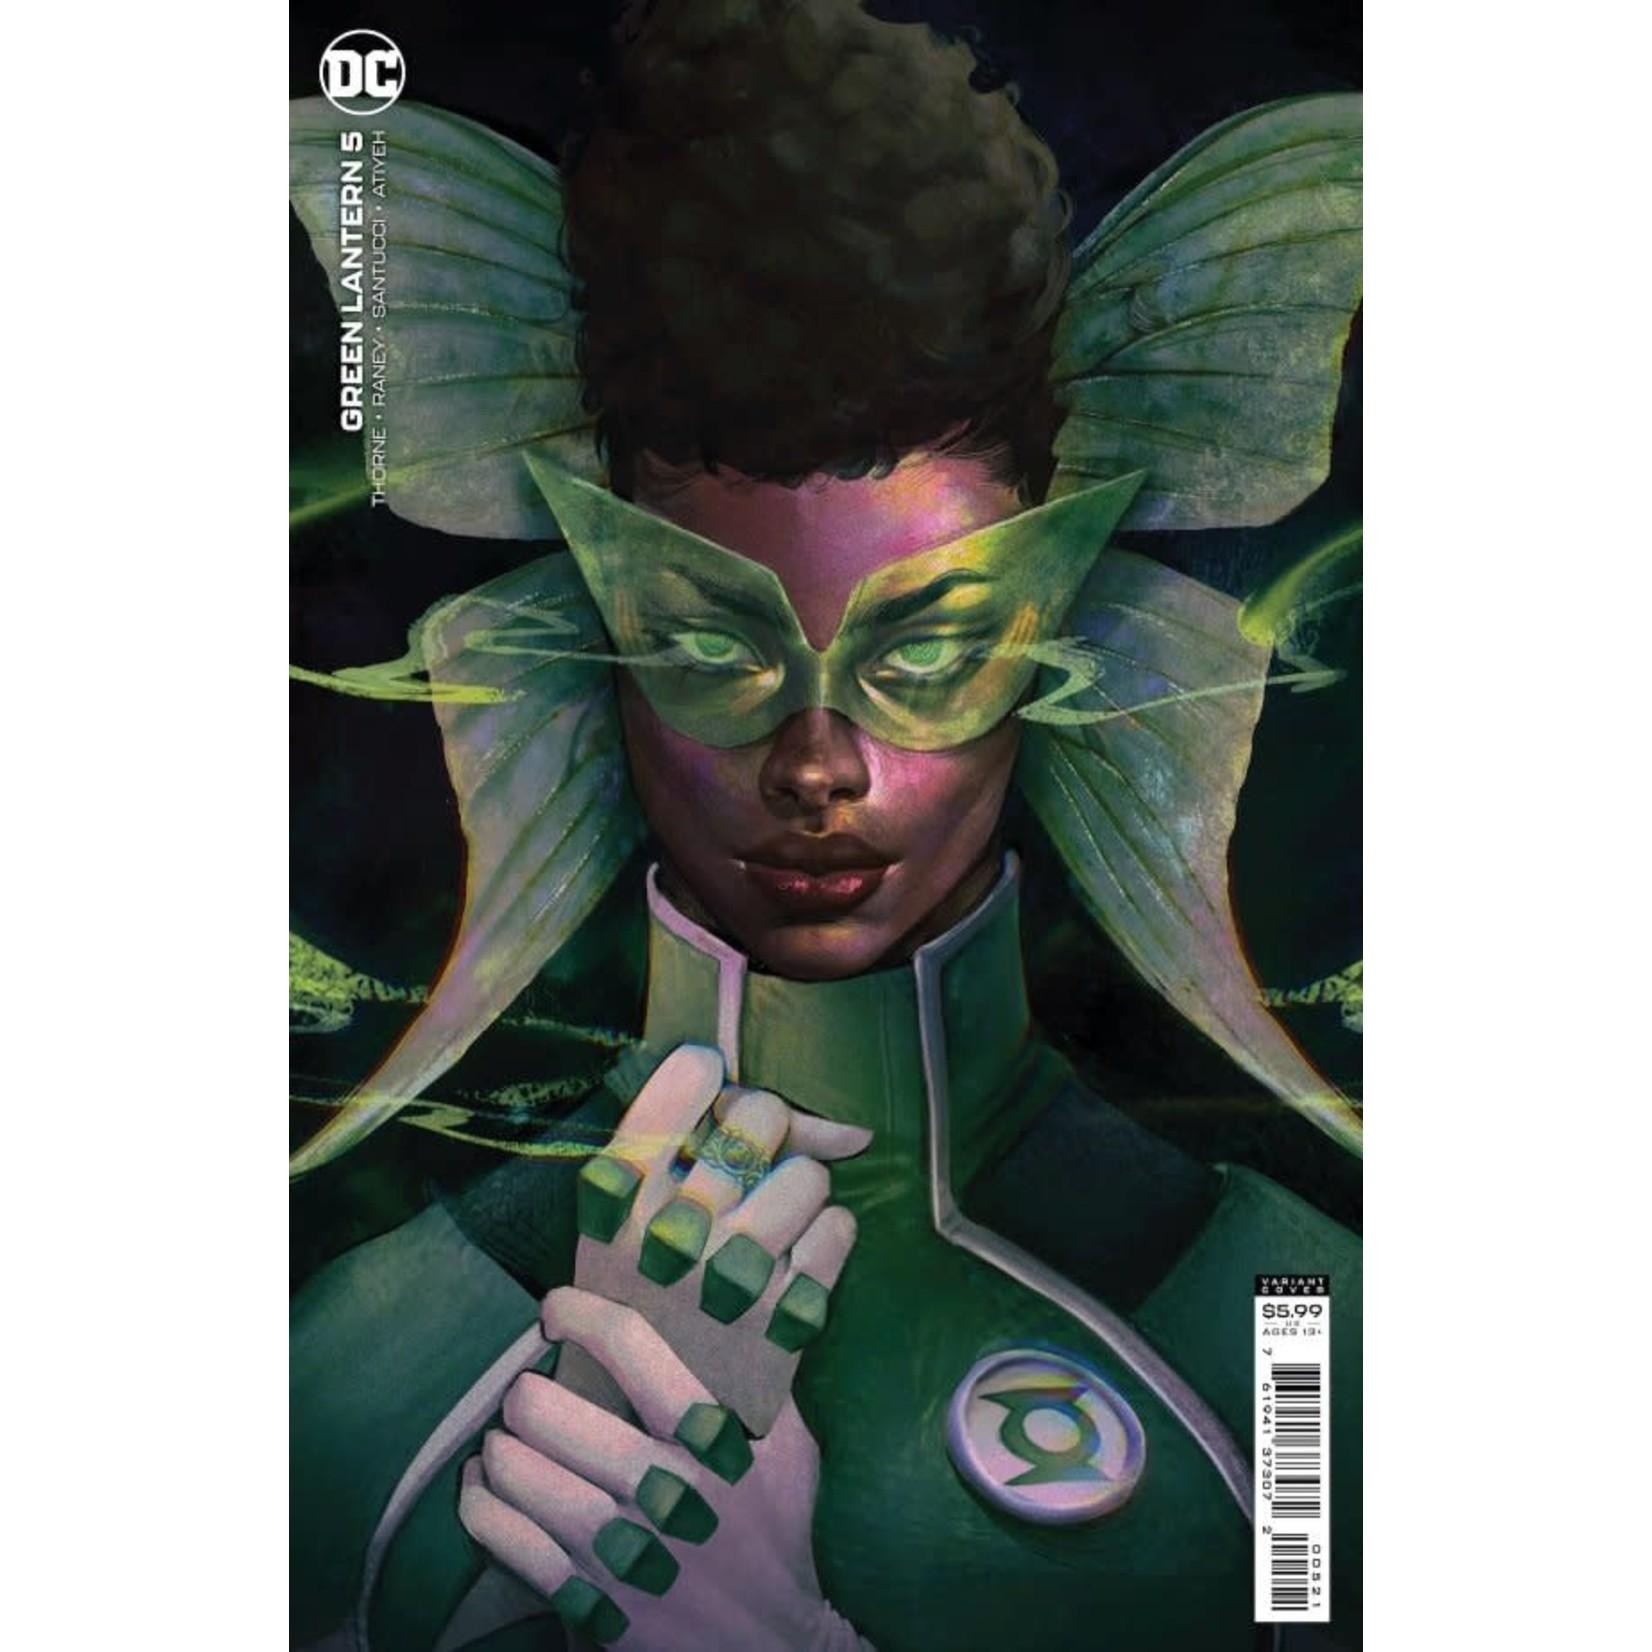 DC Comics GREEN LANTERN #5 CVR B